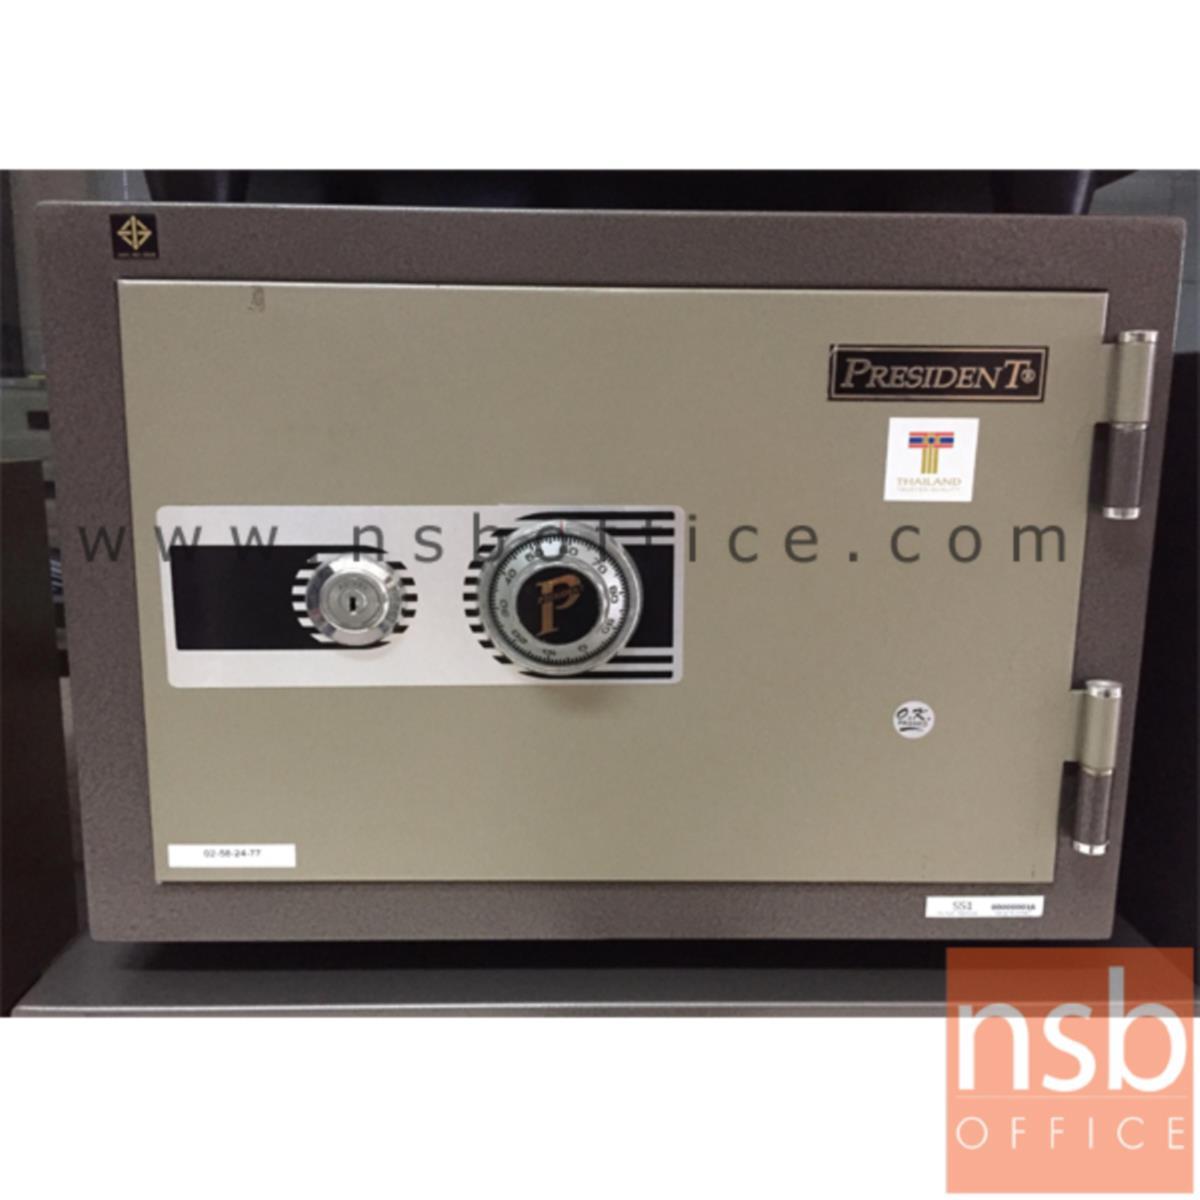 F05A048:ตู้เซฟนิรภัยชนิดหมุน 50 กก.  รุ่น PRESIDENT-SS1T มีถาด 4 อัน มี 1 กุญแจ 1 รหัส (ใช้หมุนหน้าตู้)